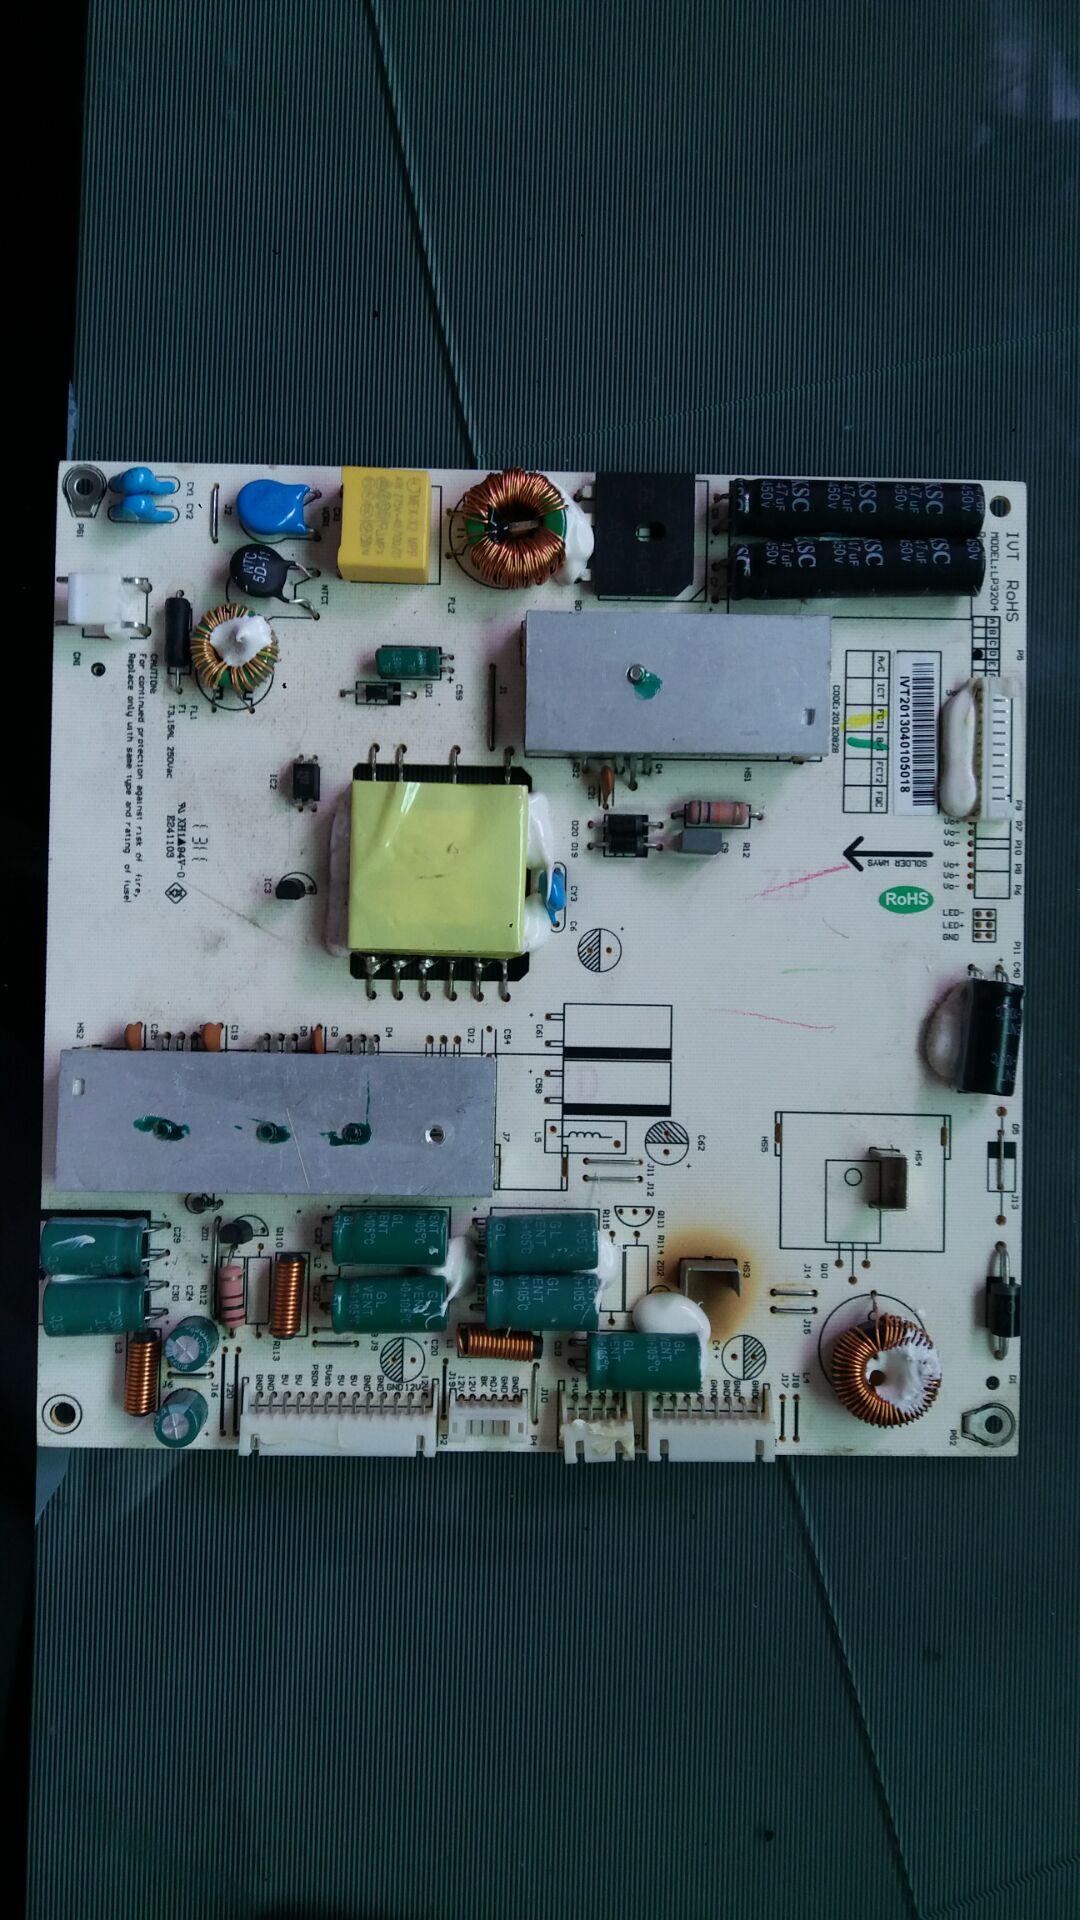 LP3204REV:06 landschafts - 32 - Zoll - 37 - Zoll - LED - TV - Power plate